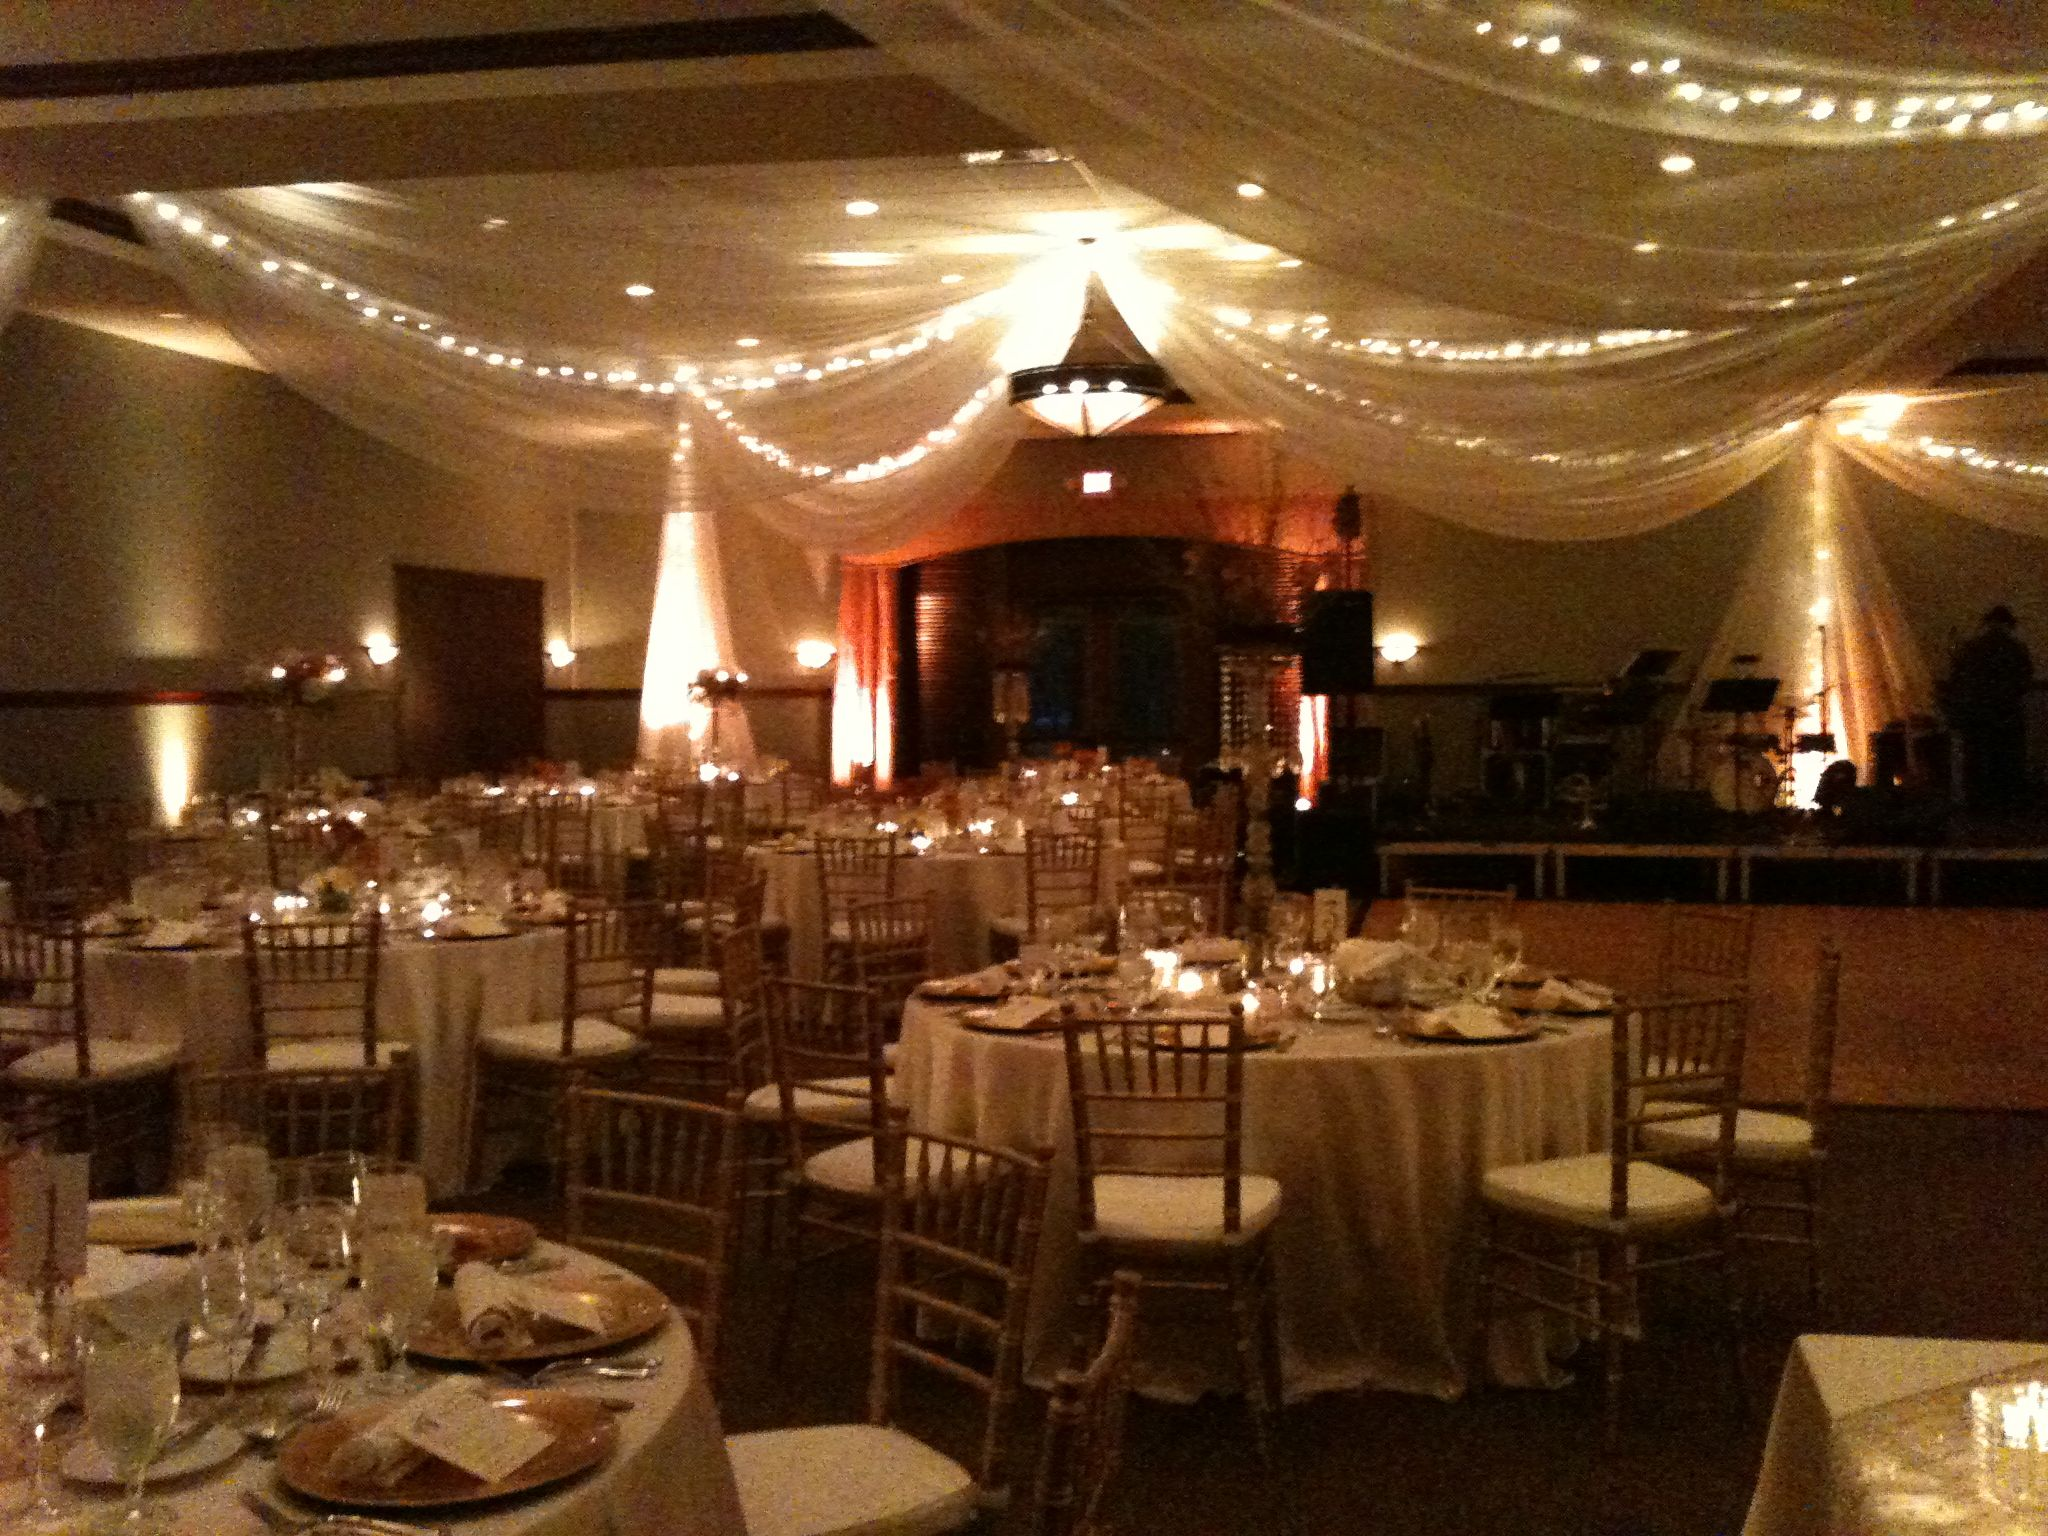 Beautiful wedding dinner